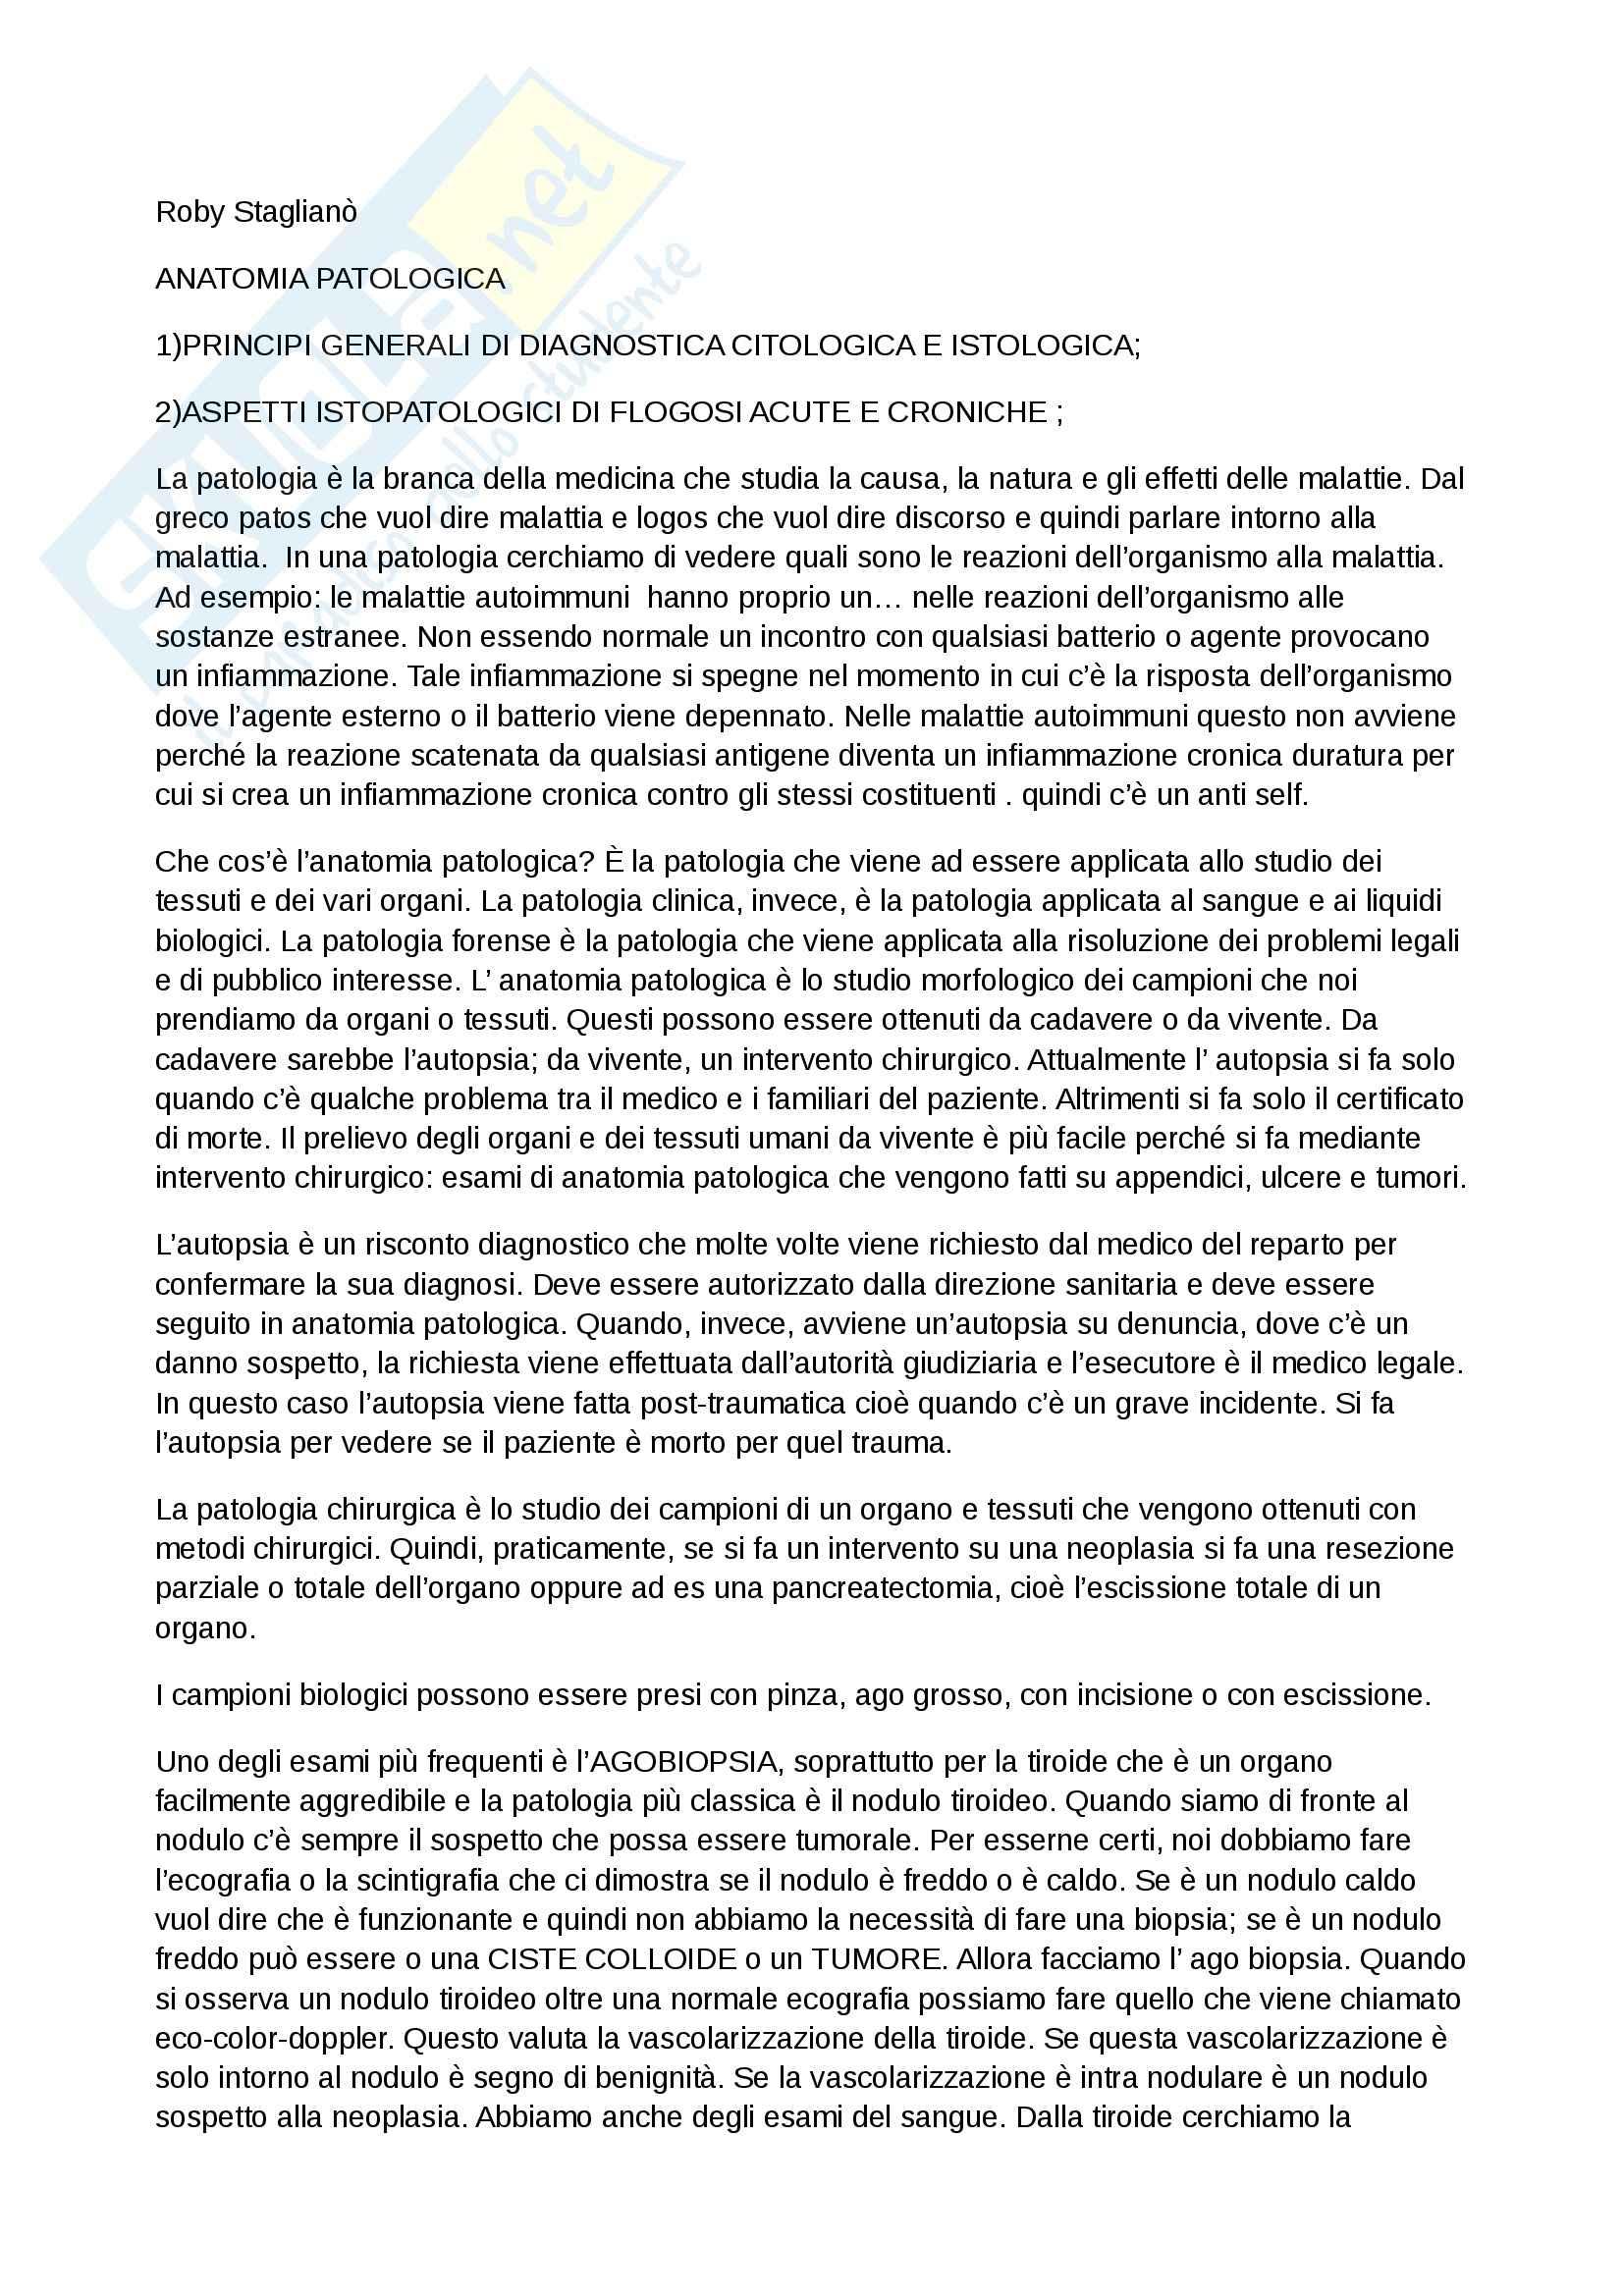 Diagnostica citologica e istologica, Anatomia patologica